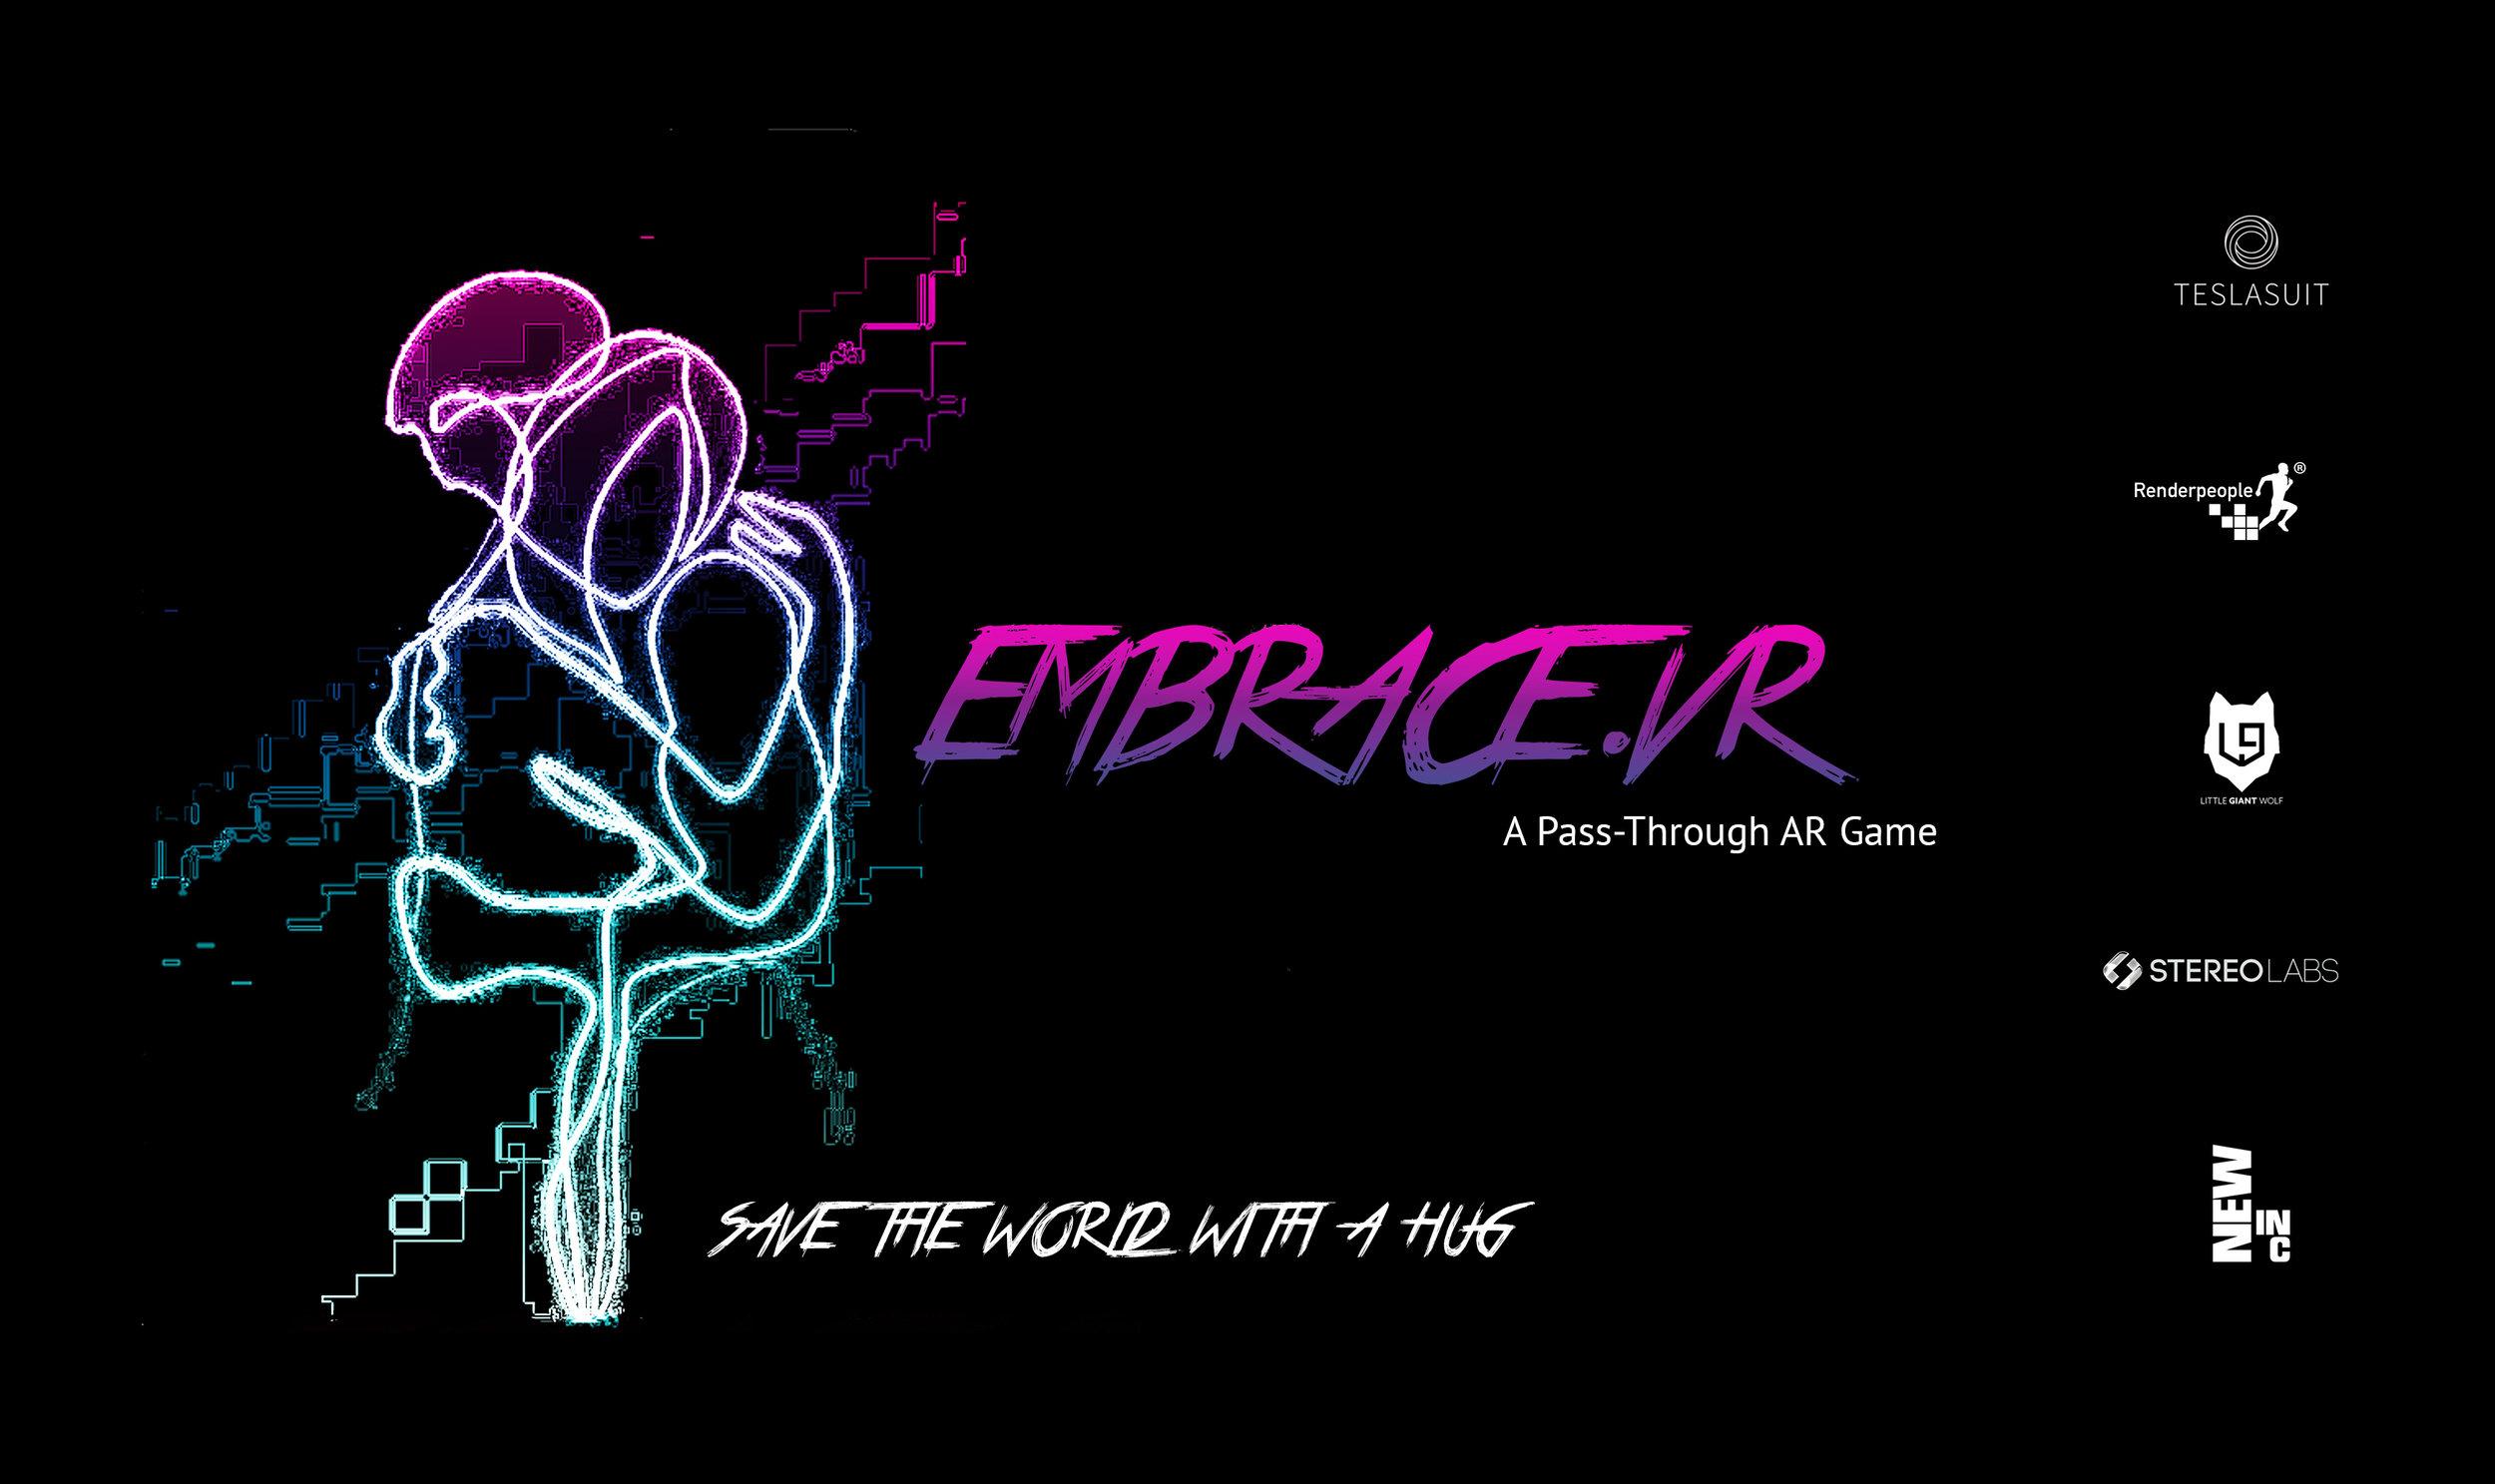 EmrbaceVR poster updated wide.jpg